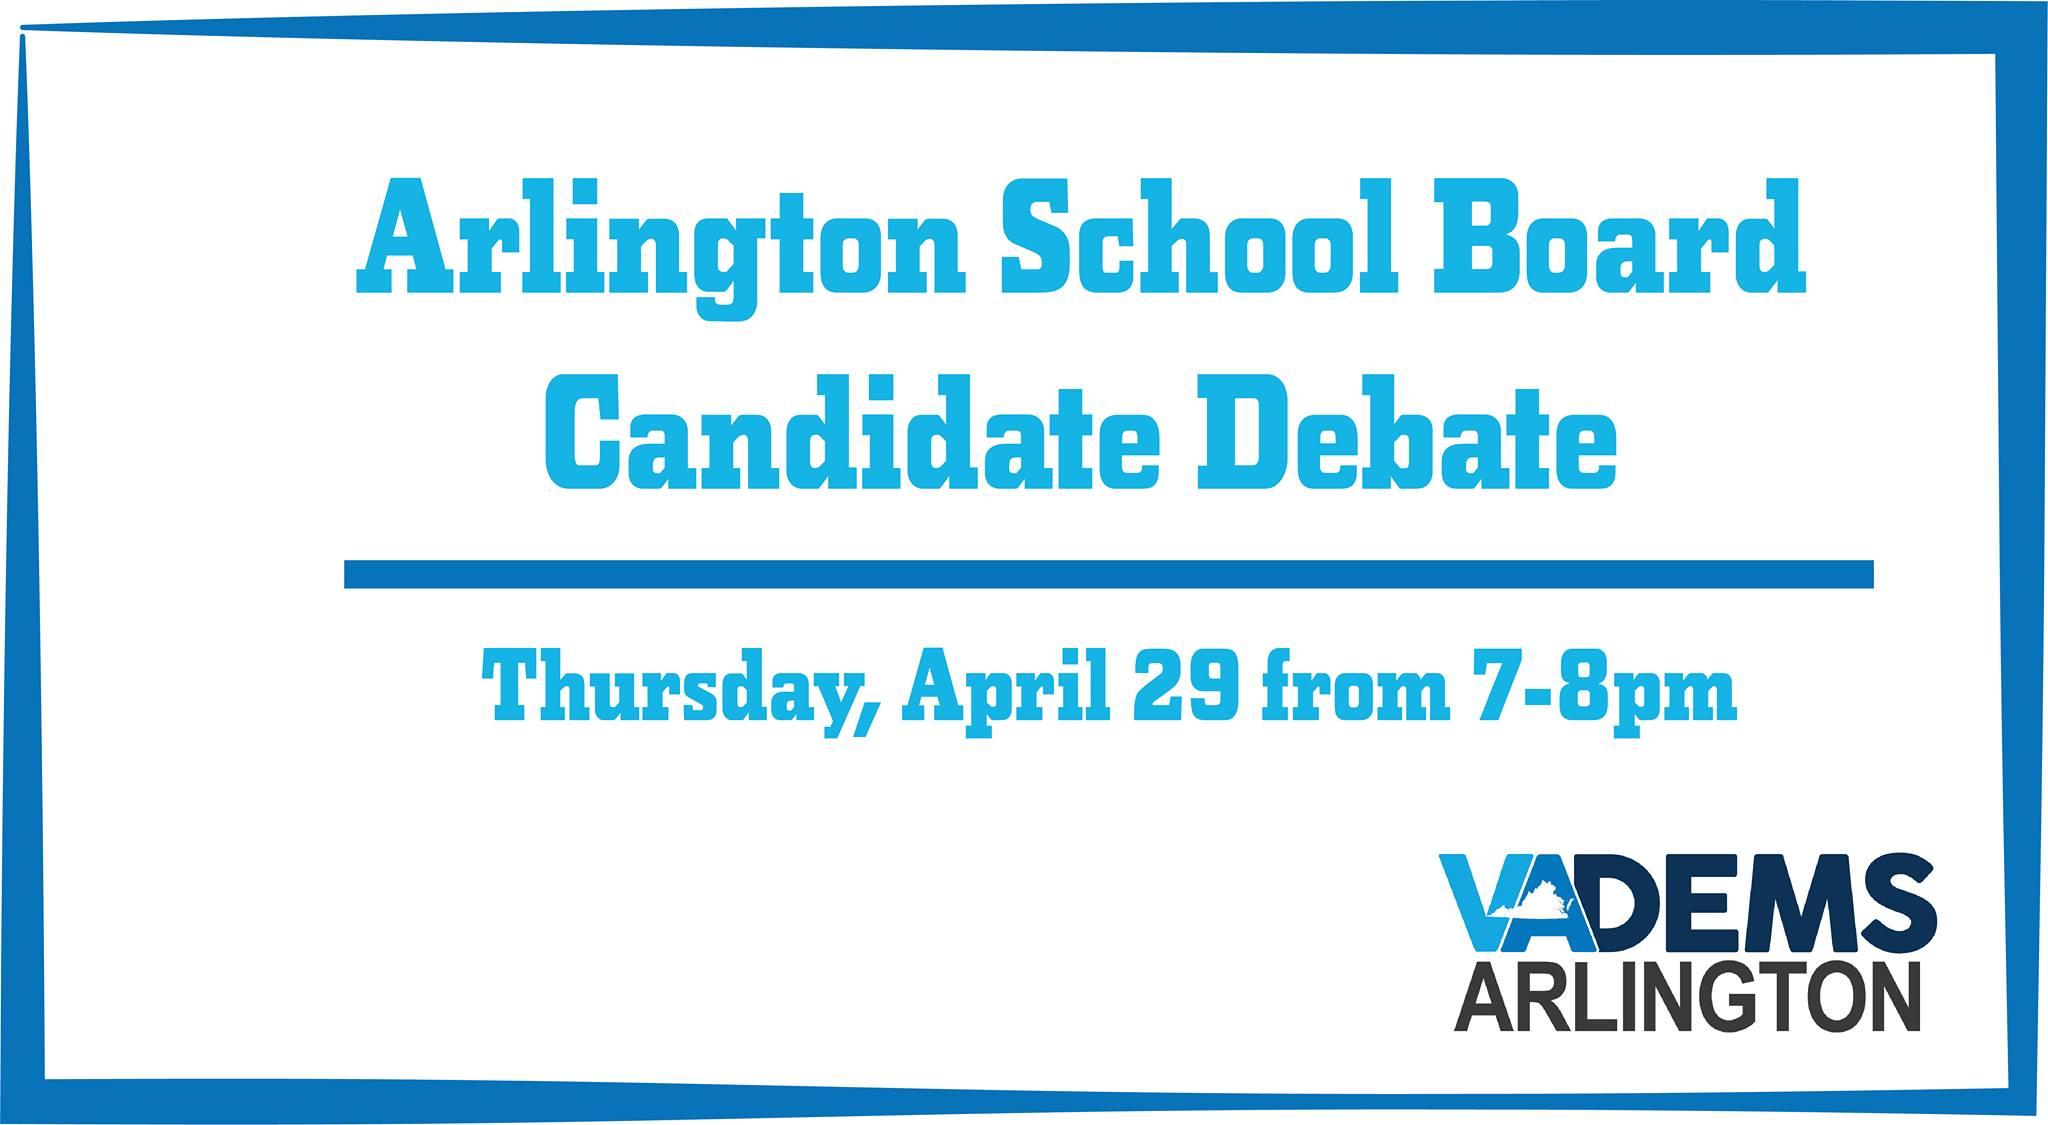 School Board Candidate Debate